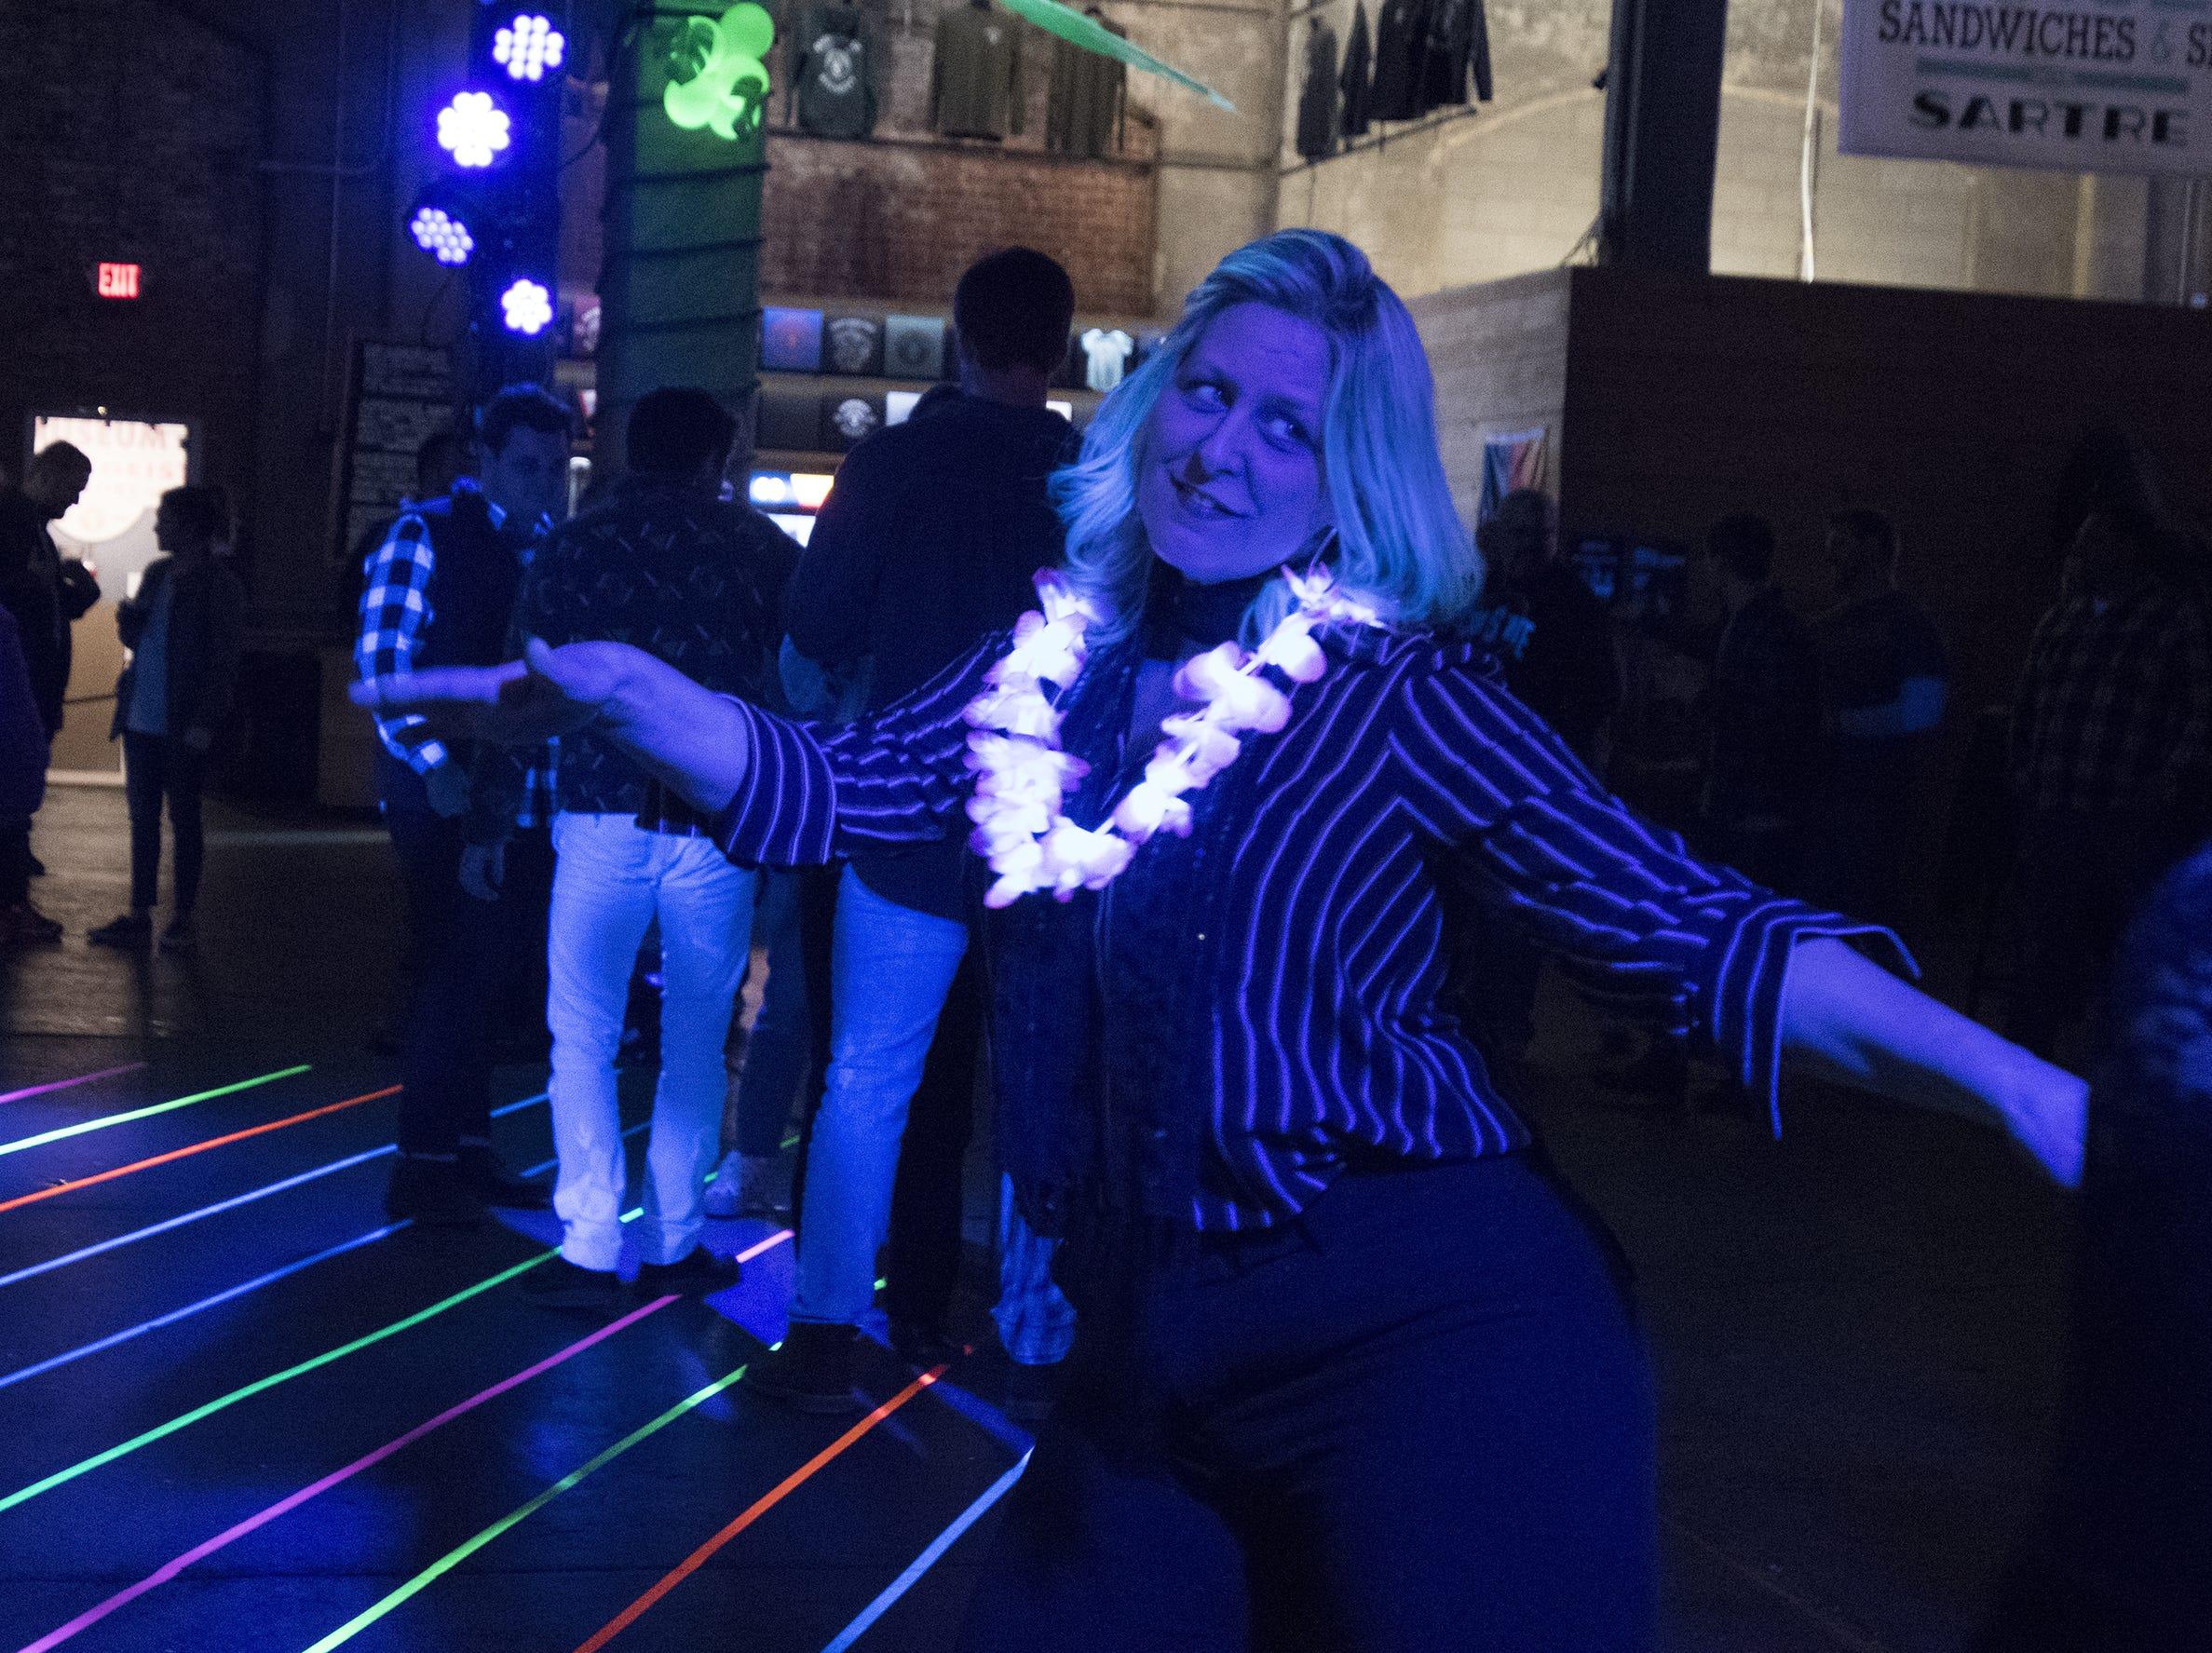 Malinda Uetrecht grooves on the dance floor.